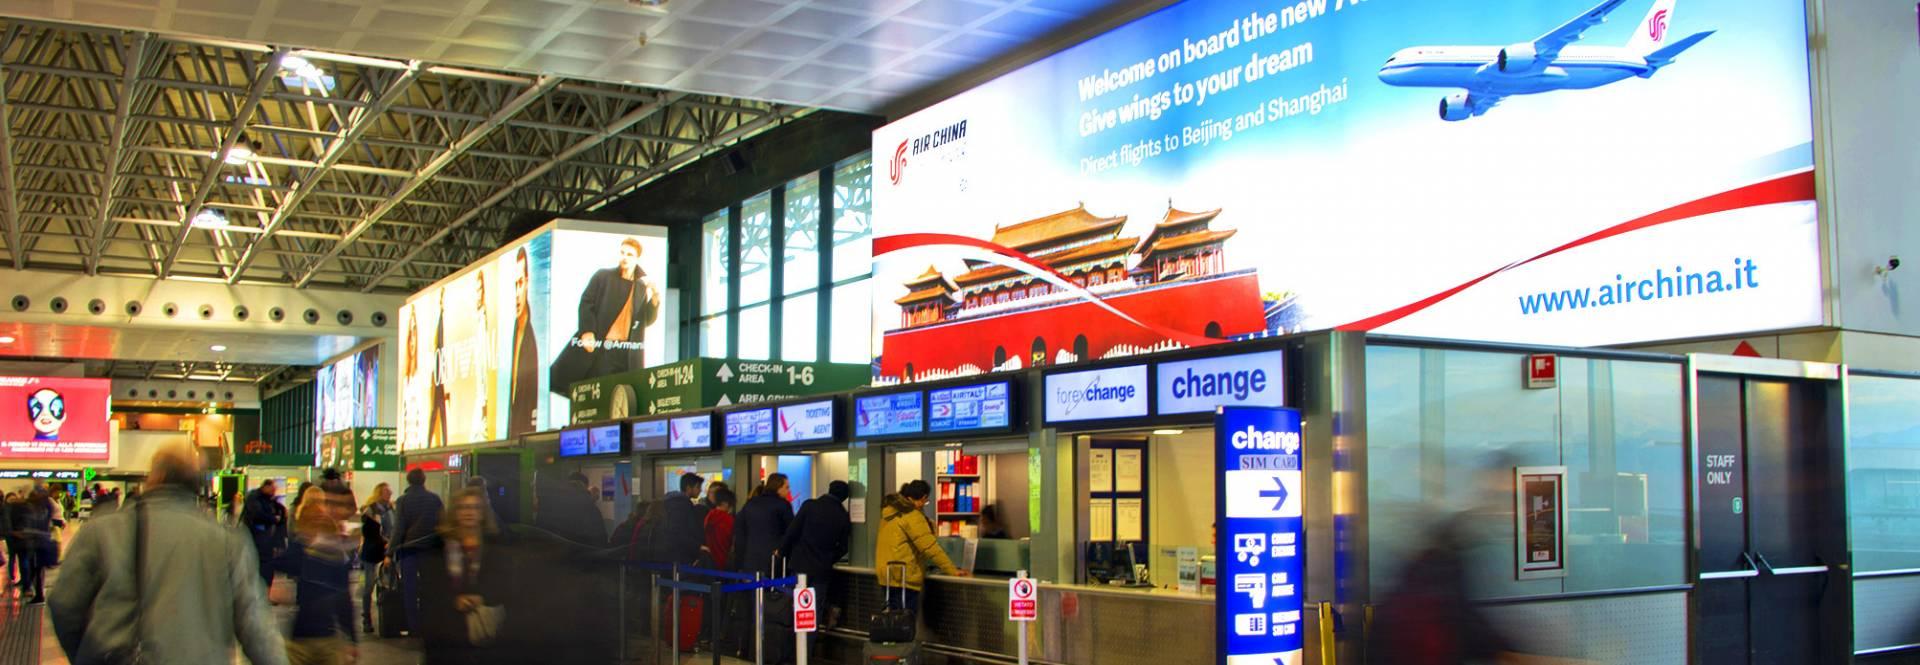 Air China viaggia a Milano con IGPDecaux